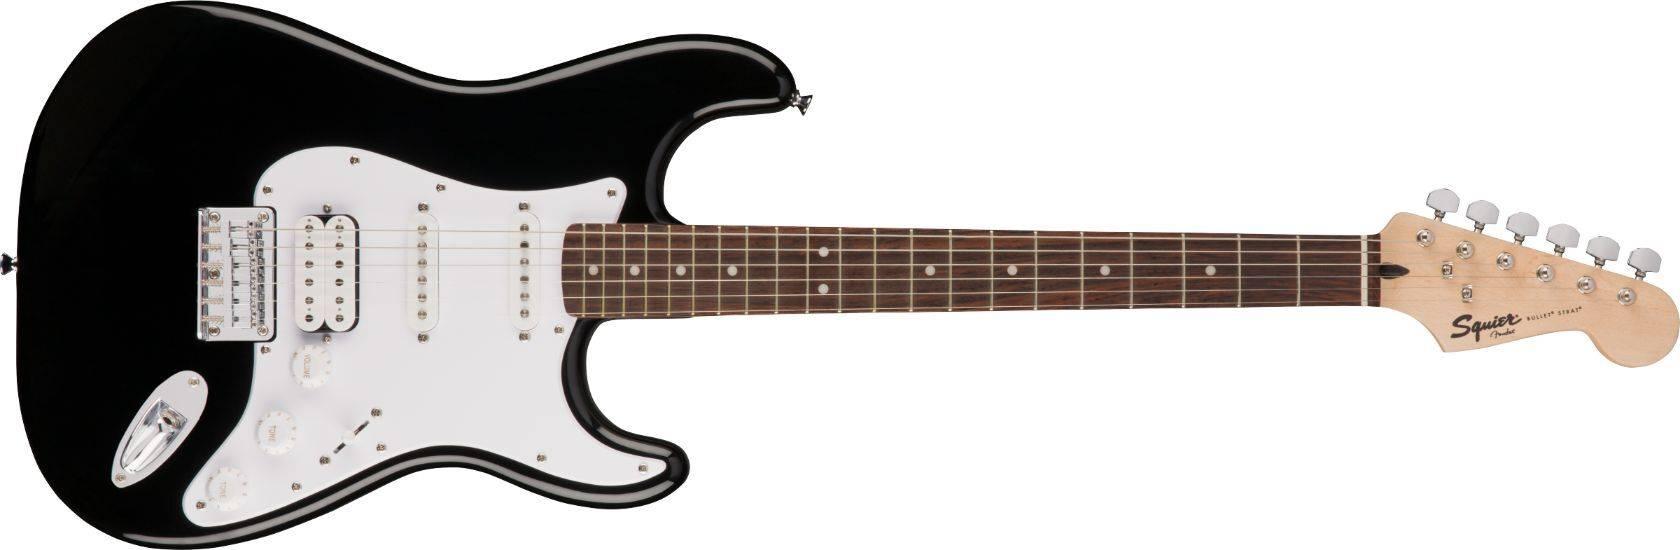 Guitarra Electrica Fender Squier Bullet Strat Ht Hss Negra